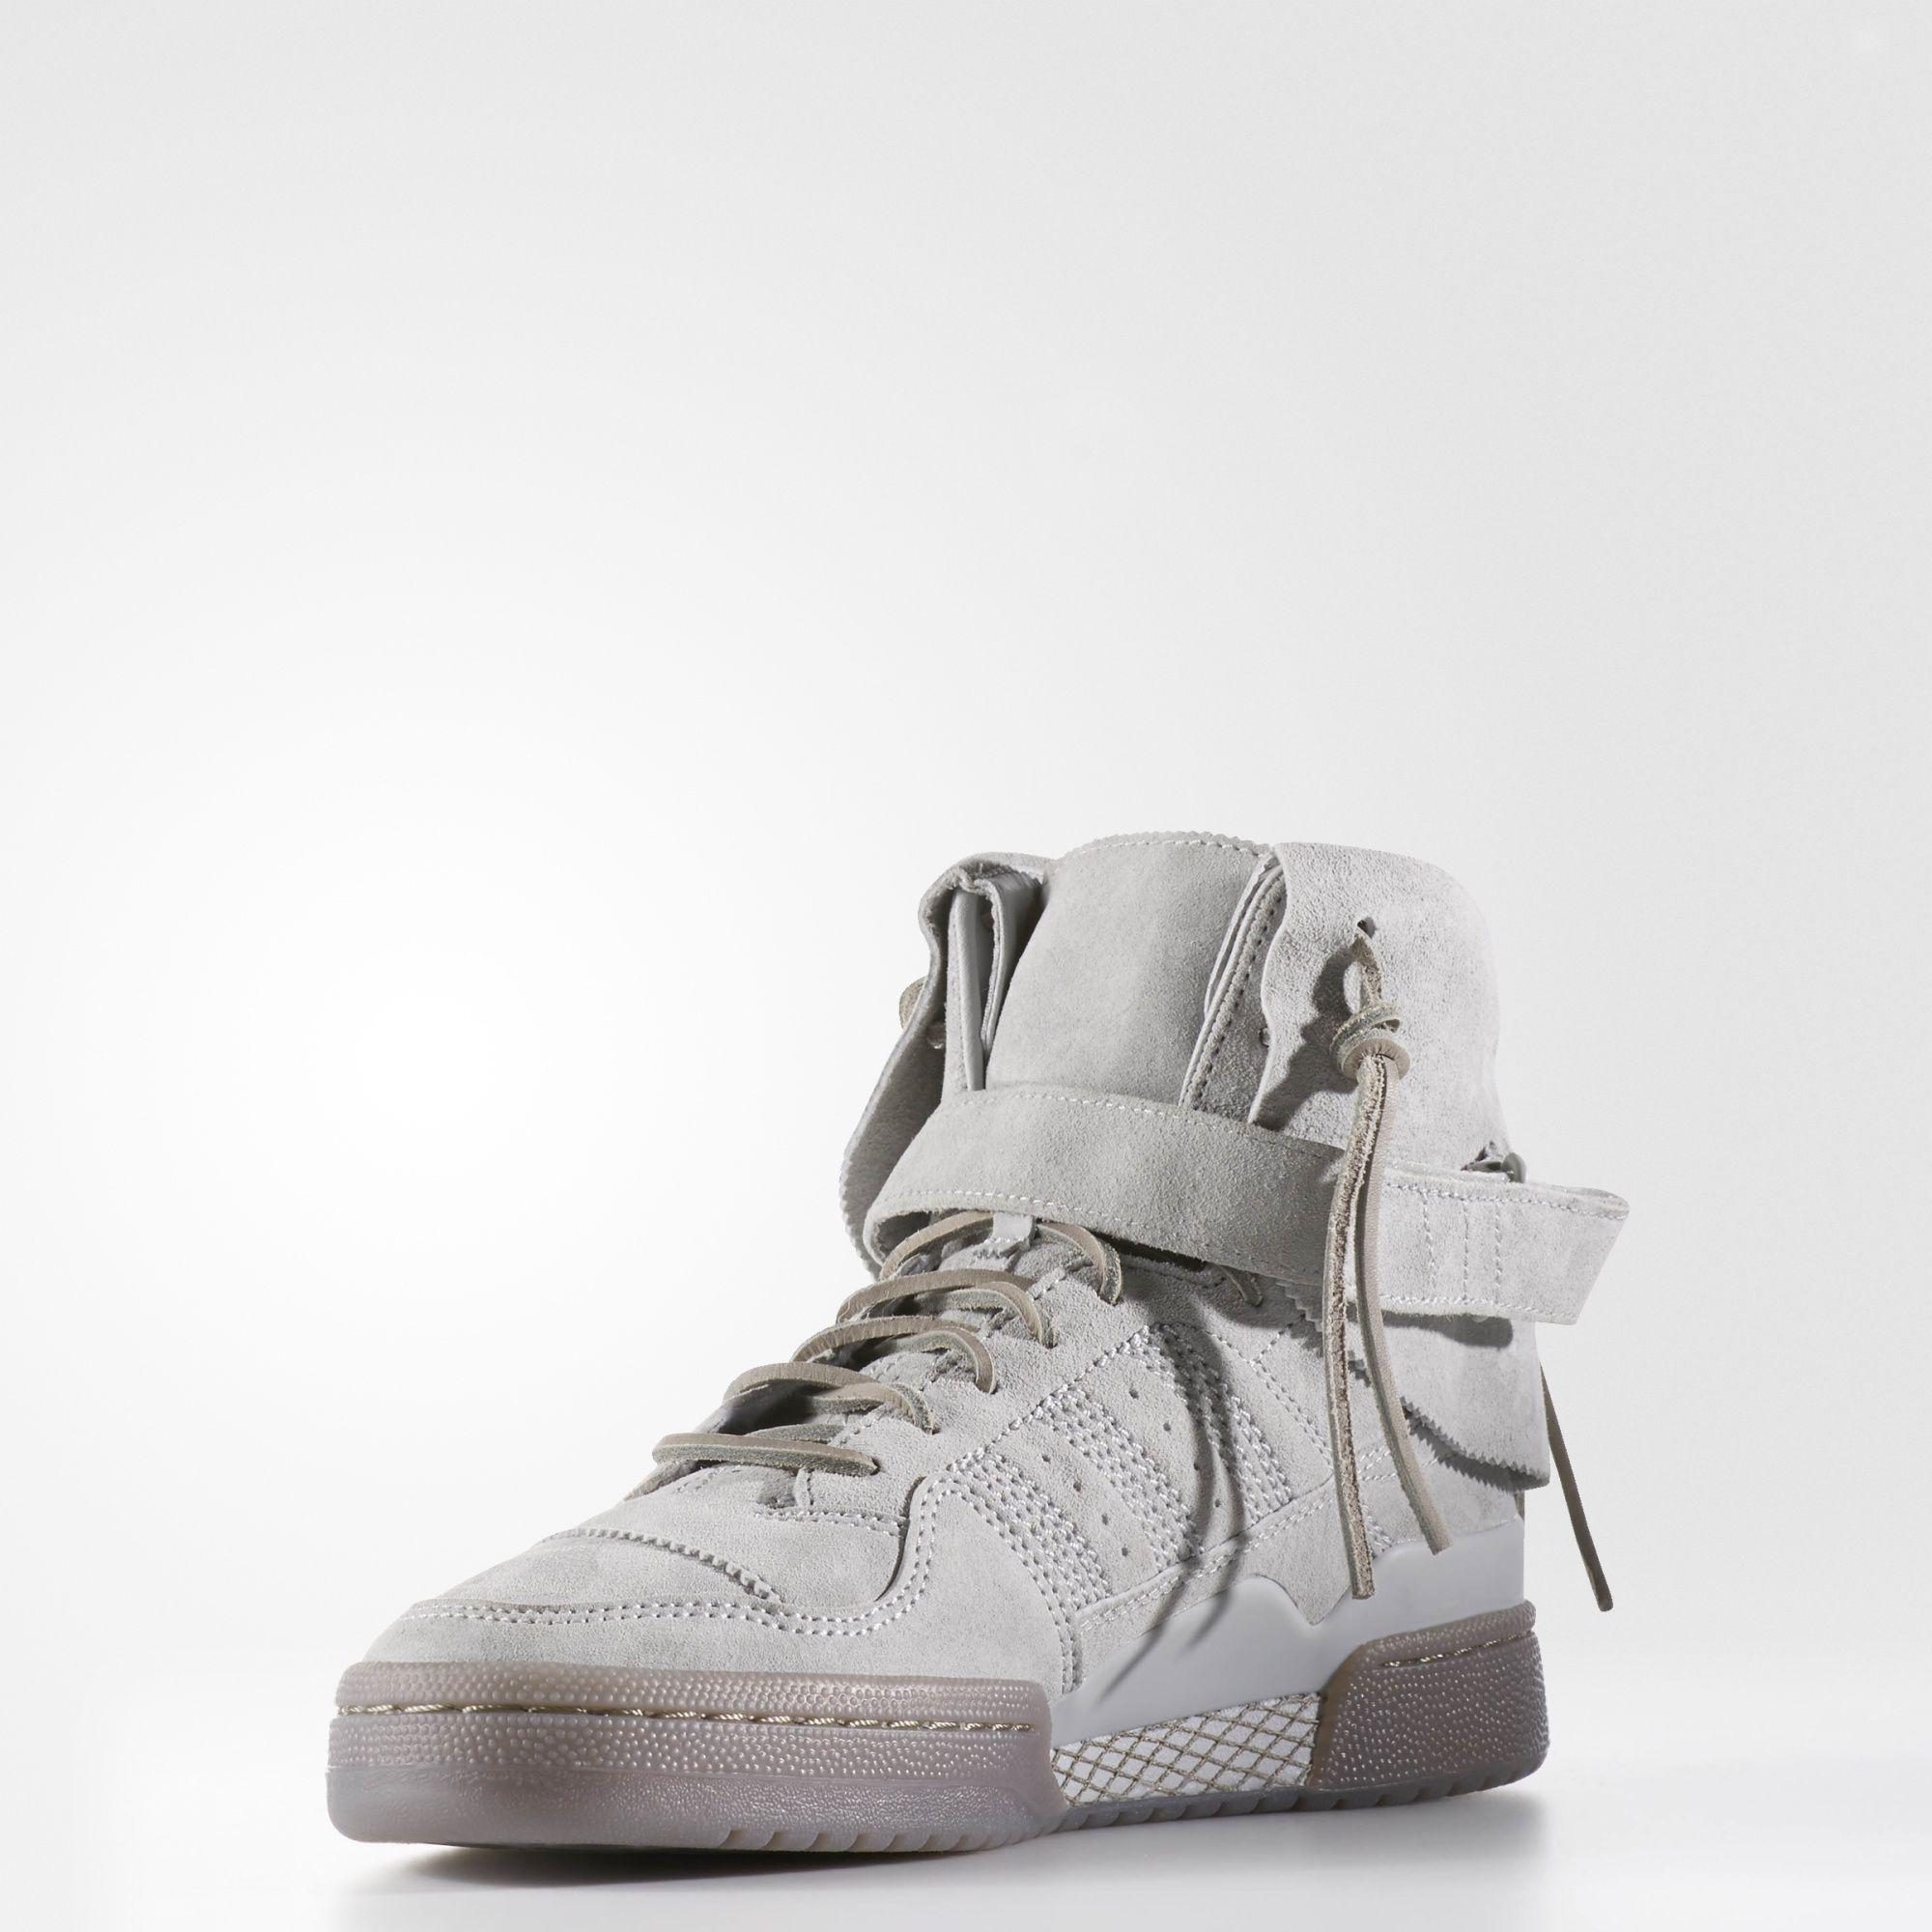 new style 5318c 9d24b adidas - FORUM HI MOC SHOES Stone  Ice Grey B27682